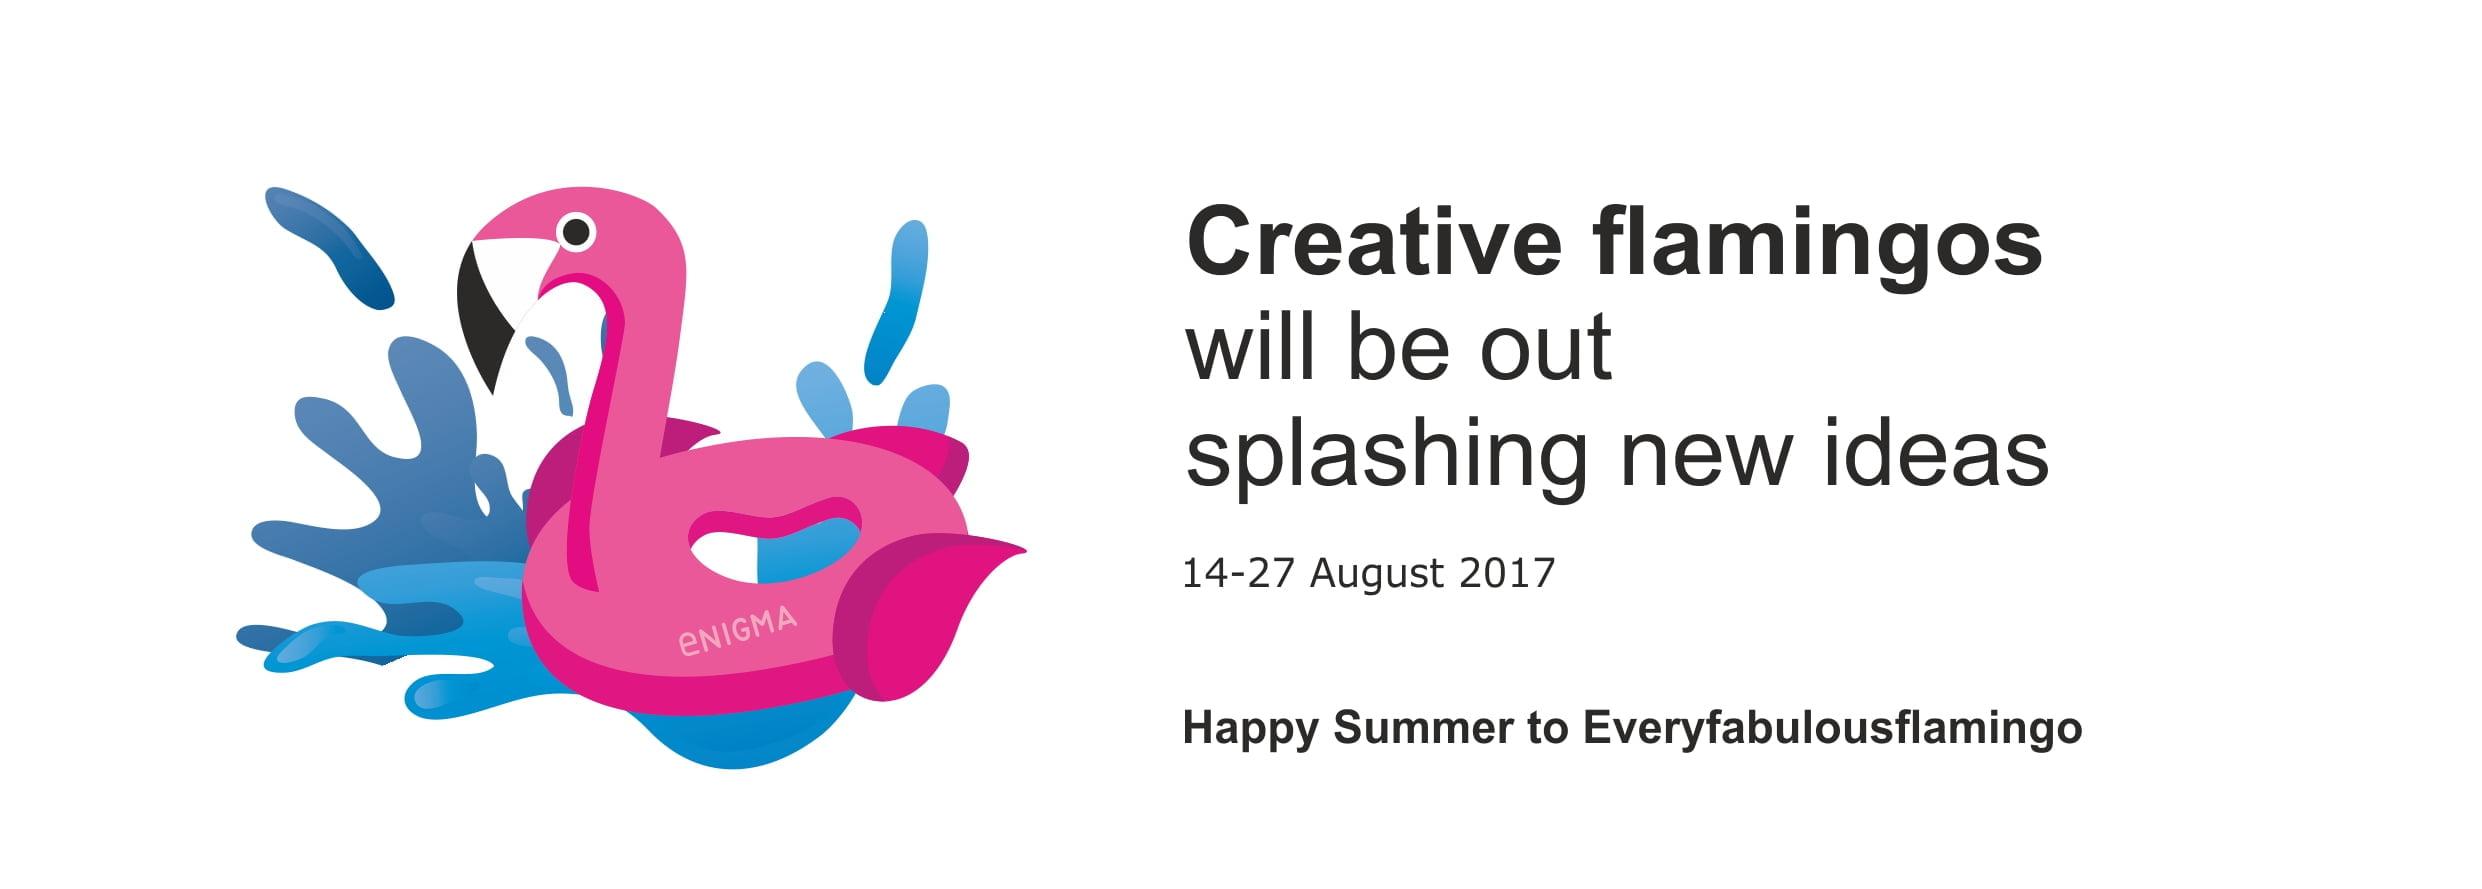 cyprus advertising agency summer holidays